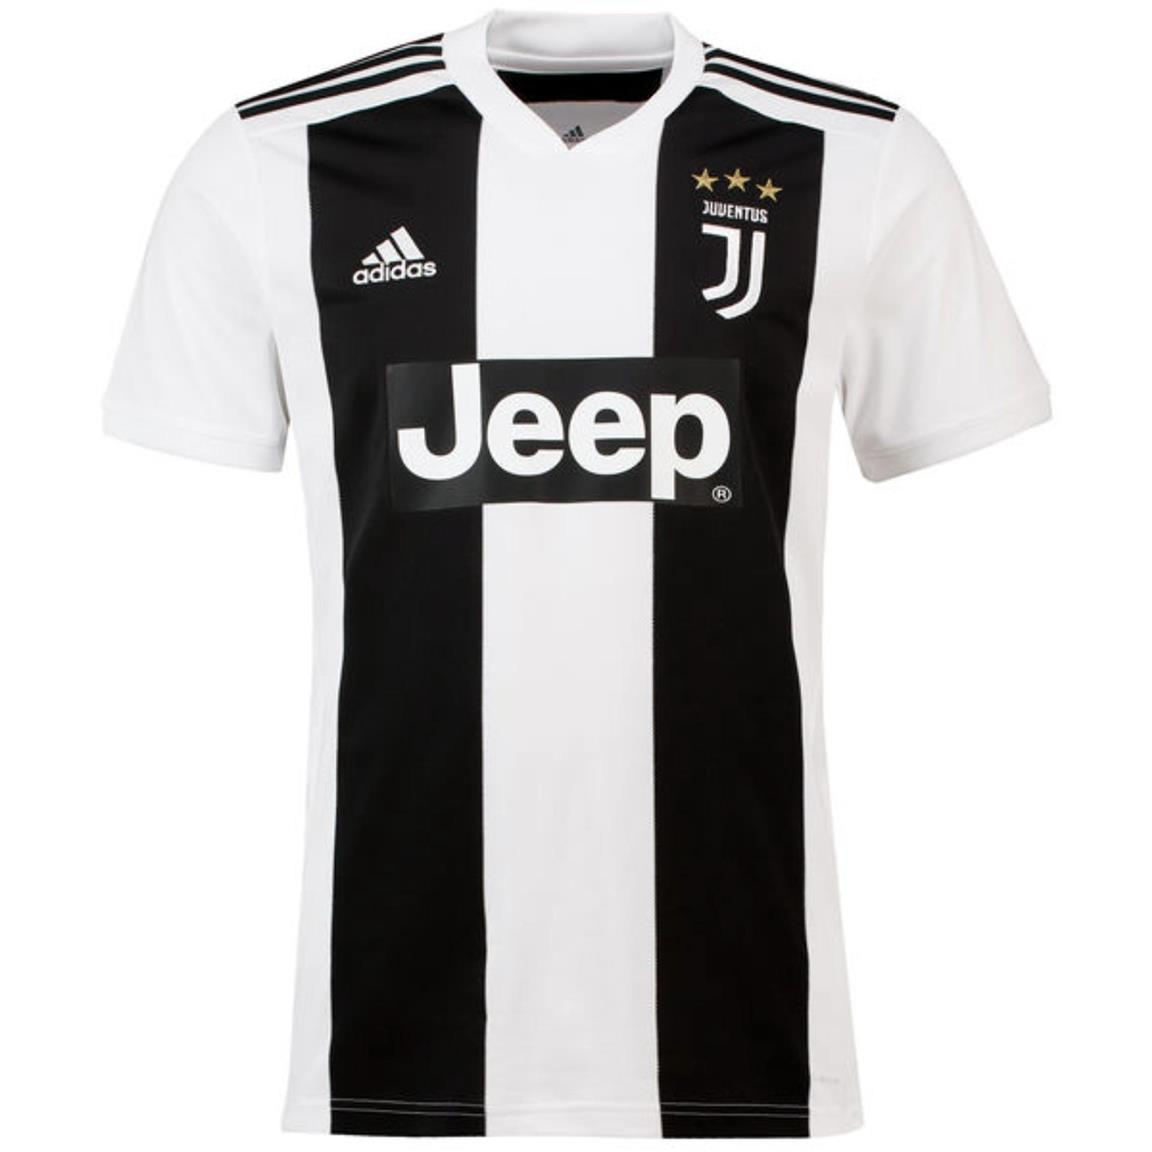 b0a475745 Adidas Mens Techfit Primeknit Football Jersey